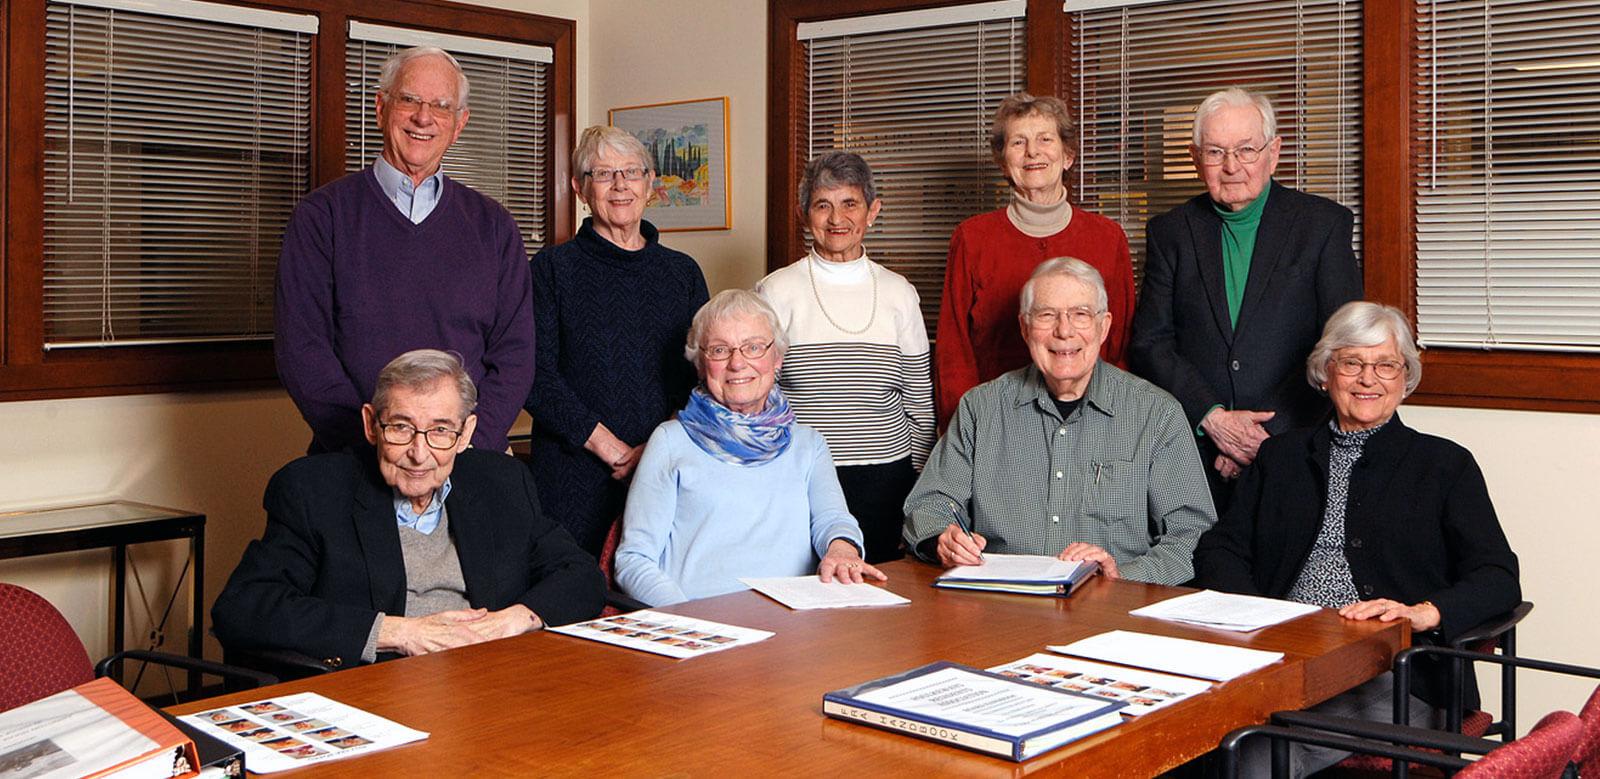 Foulkeways Residents Association (FRA)